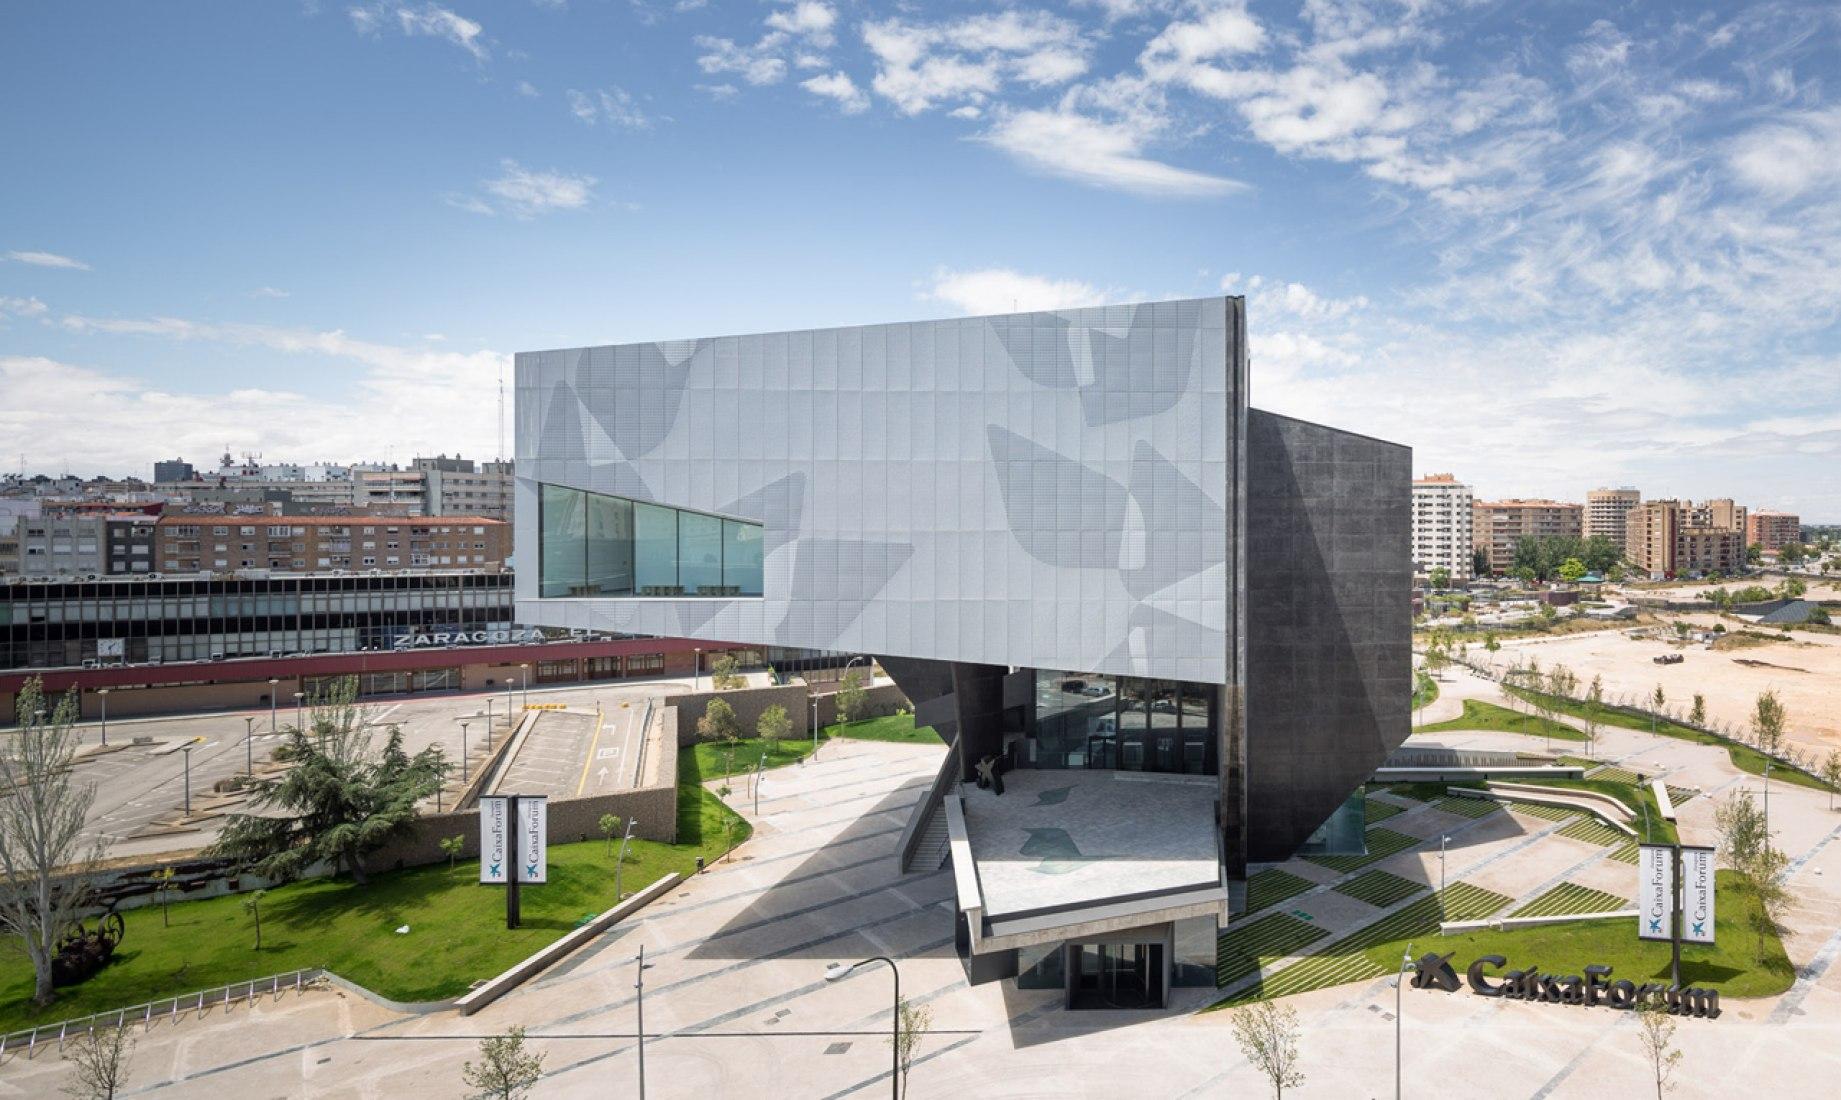 Vista general. Museo, Auditorio y Centro Cultural Caixaforum de Zaragoza por Carme Pinós. Fotografía © Rubén P. Bescós.